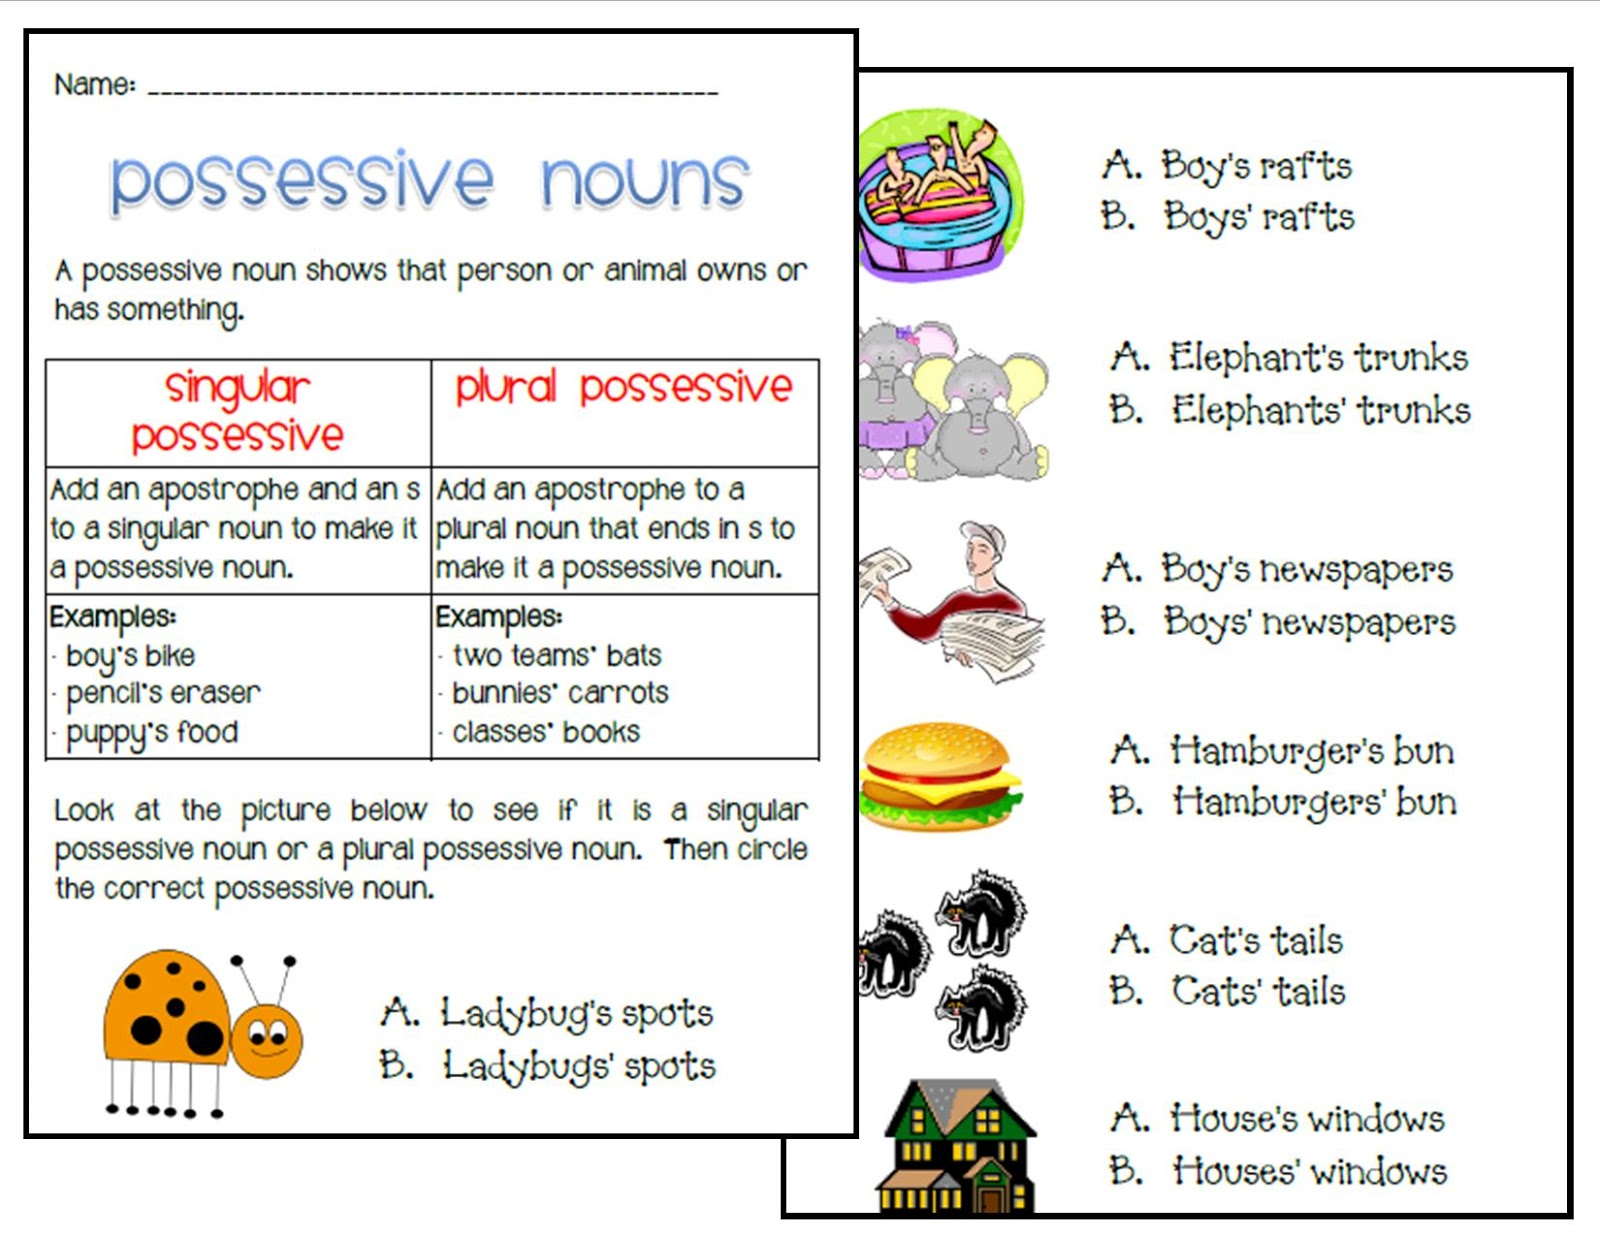 medium resolution of Possessive Nouns - Lessons - Blendspace